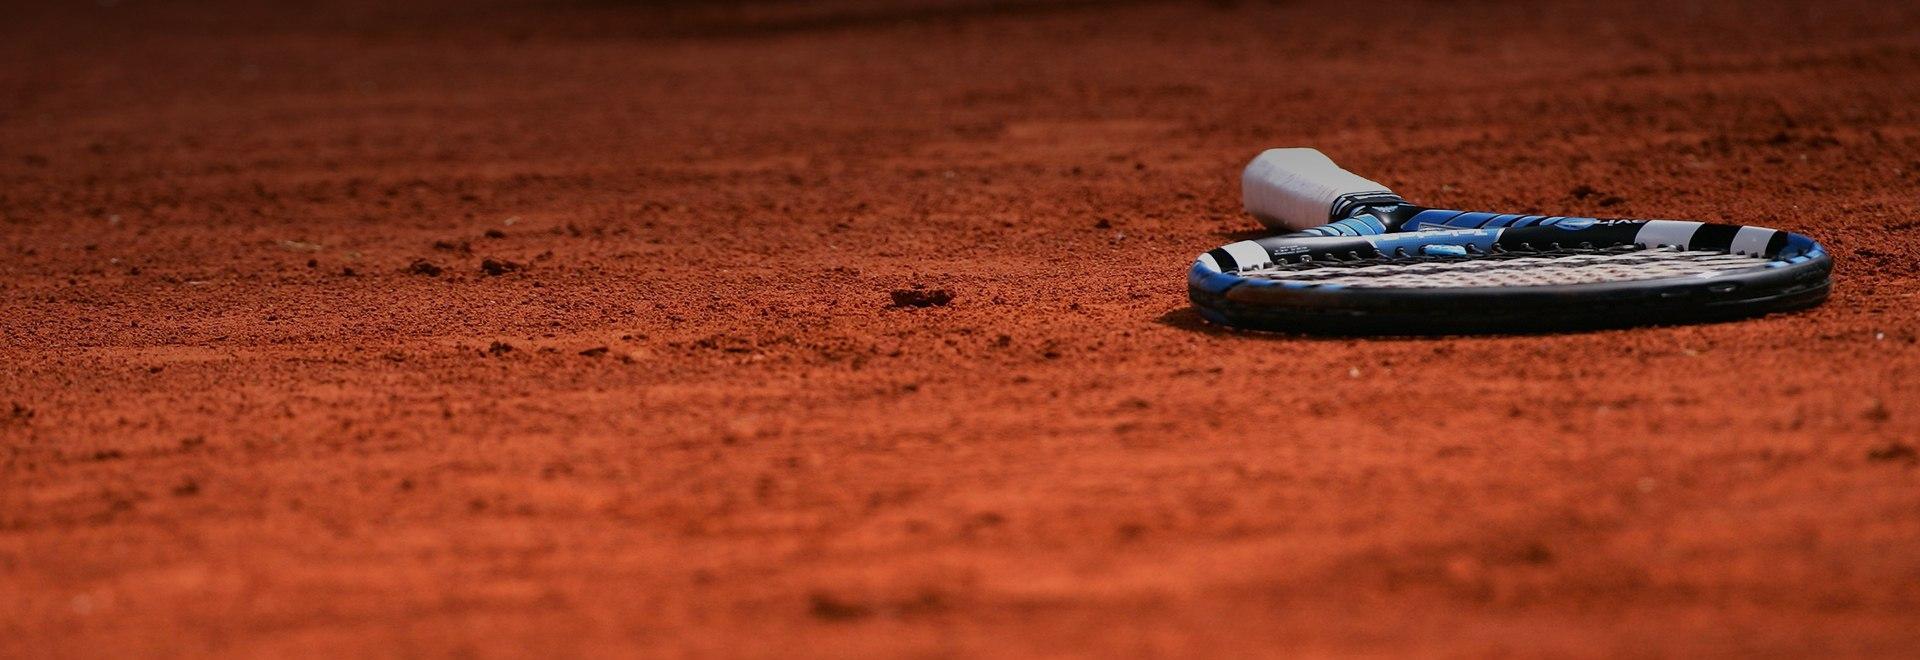 ATP World Tour Masters 1000 HL 2020